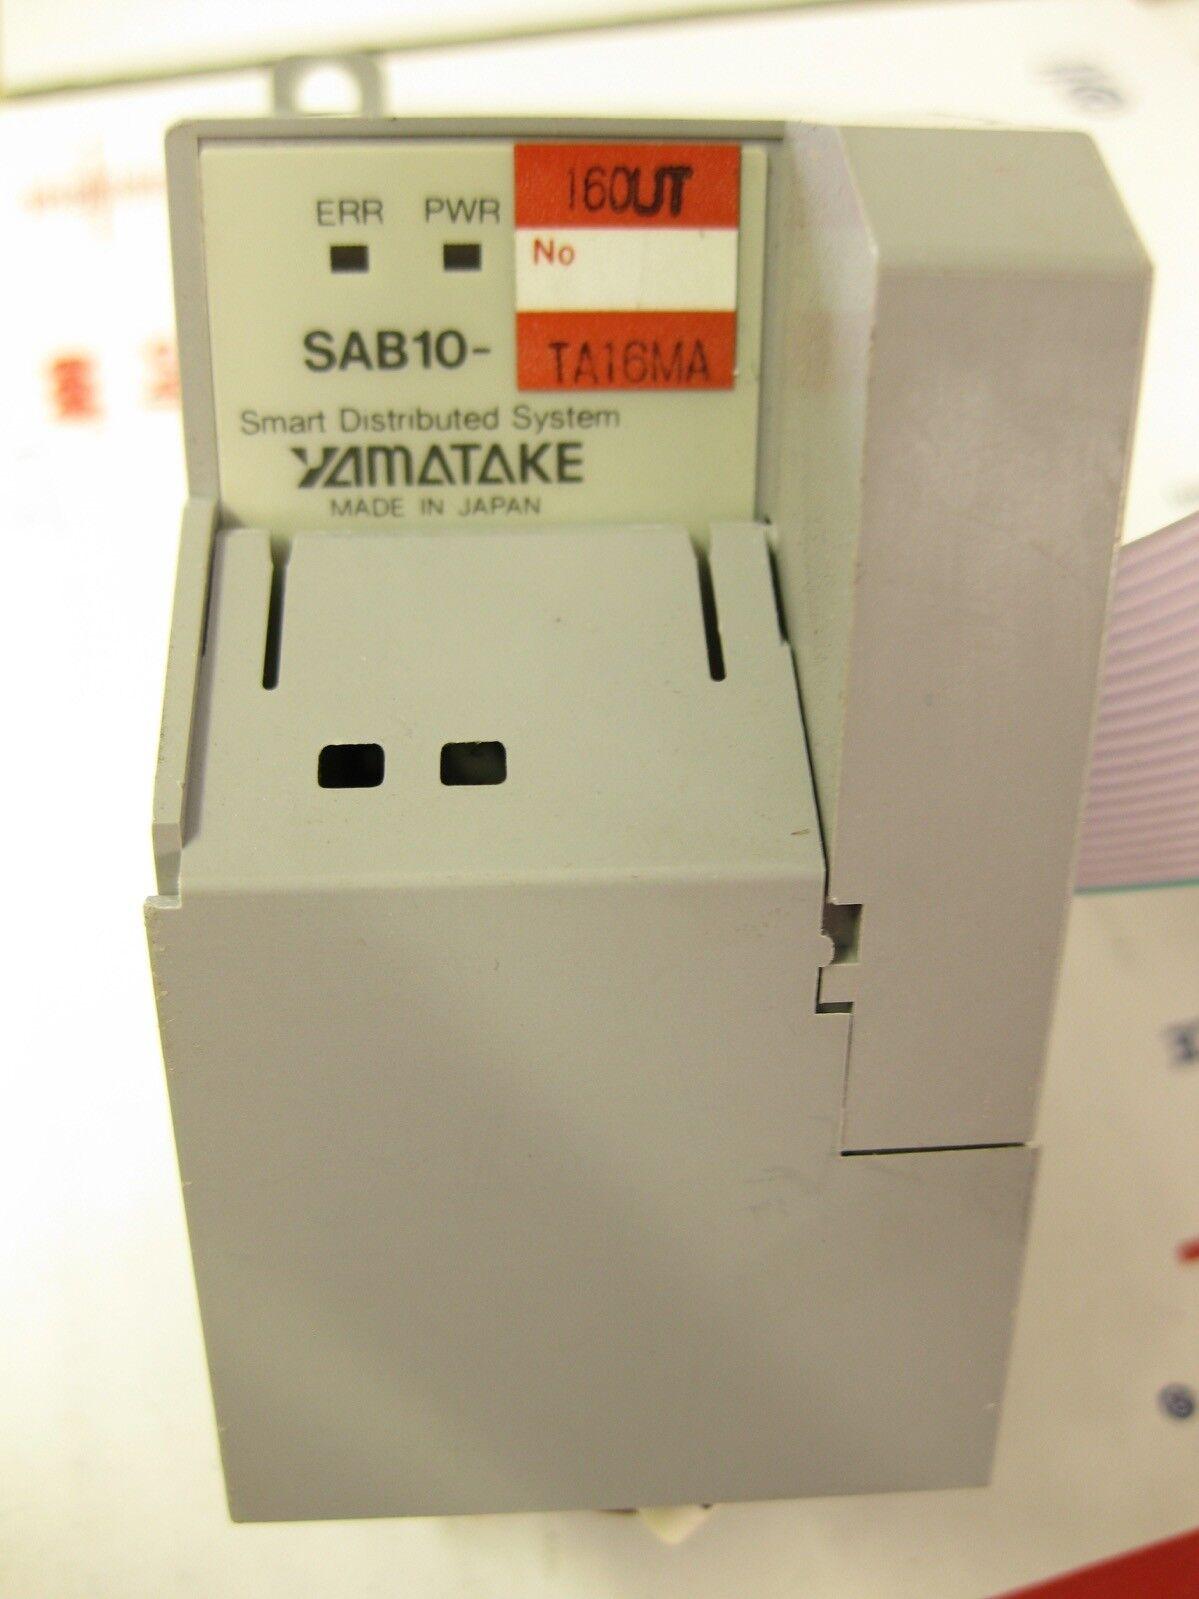 Yamatake Smart Distributed System SAB10-TA16MA 16OUTAZBIL NORTH AMERICA PLC